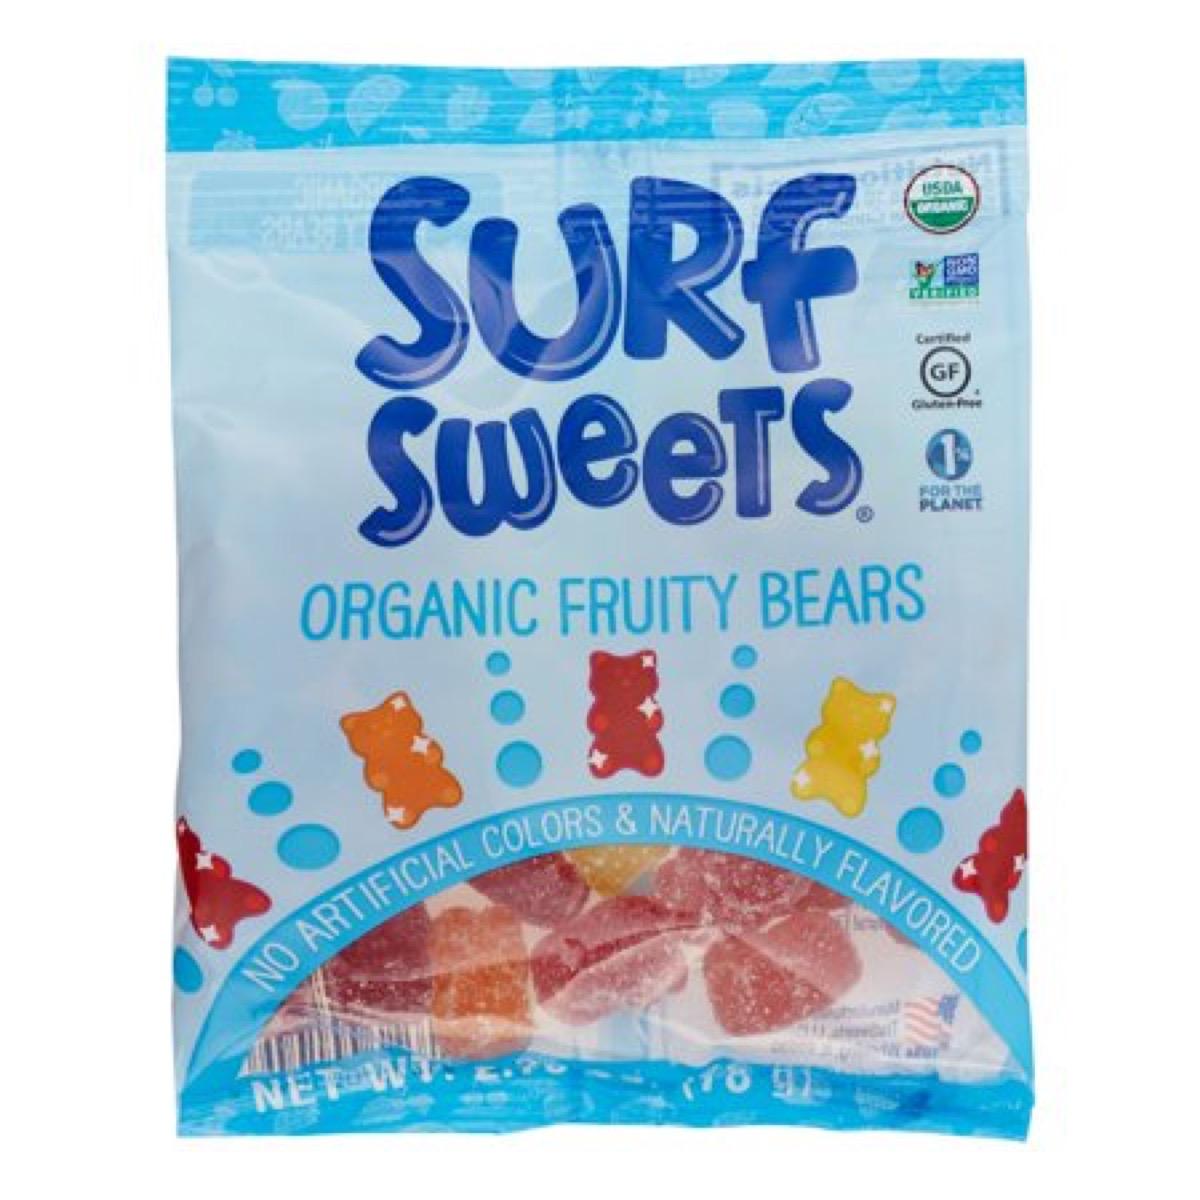 surf sweets organic fruit snacks, gluten-free snacks